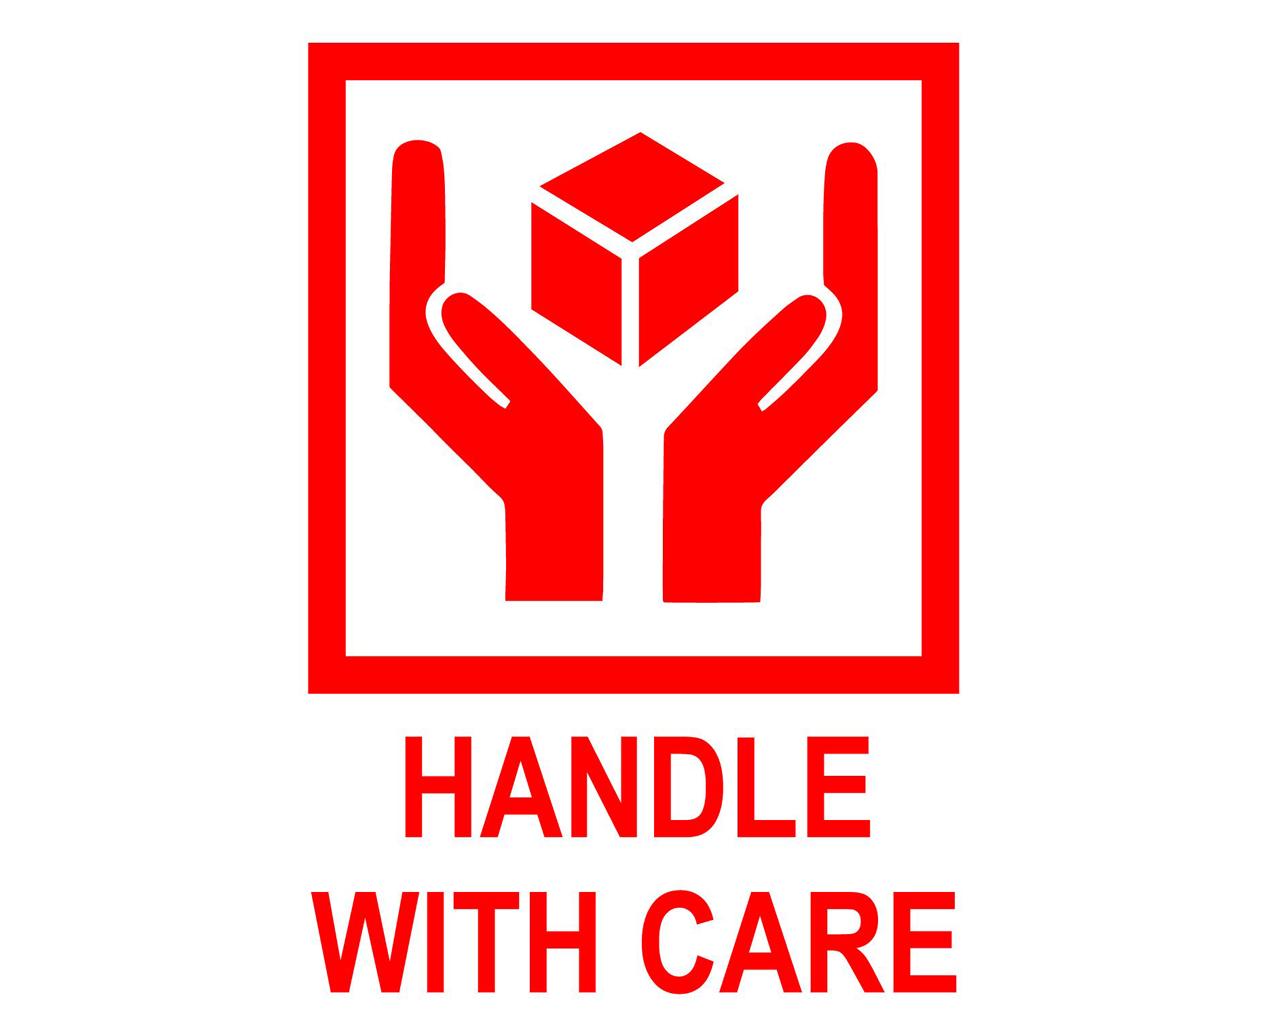 Julian Palacz_HANDLE WITH CARE